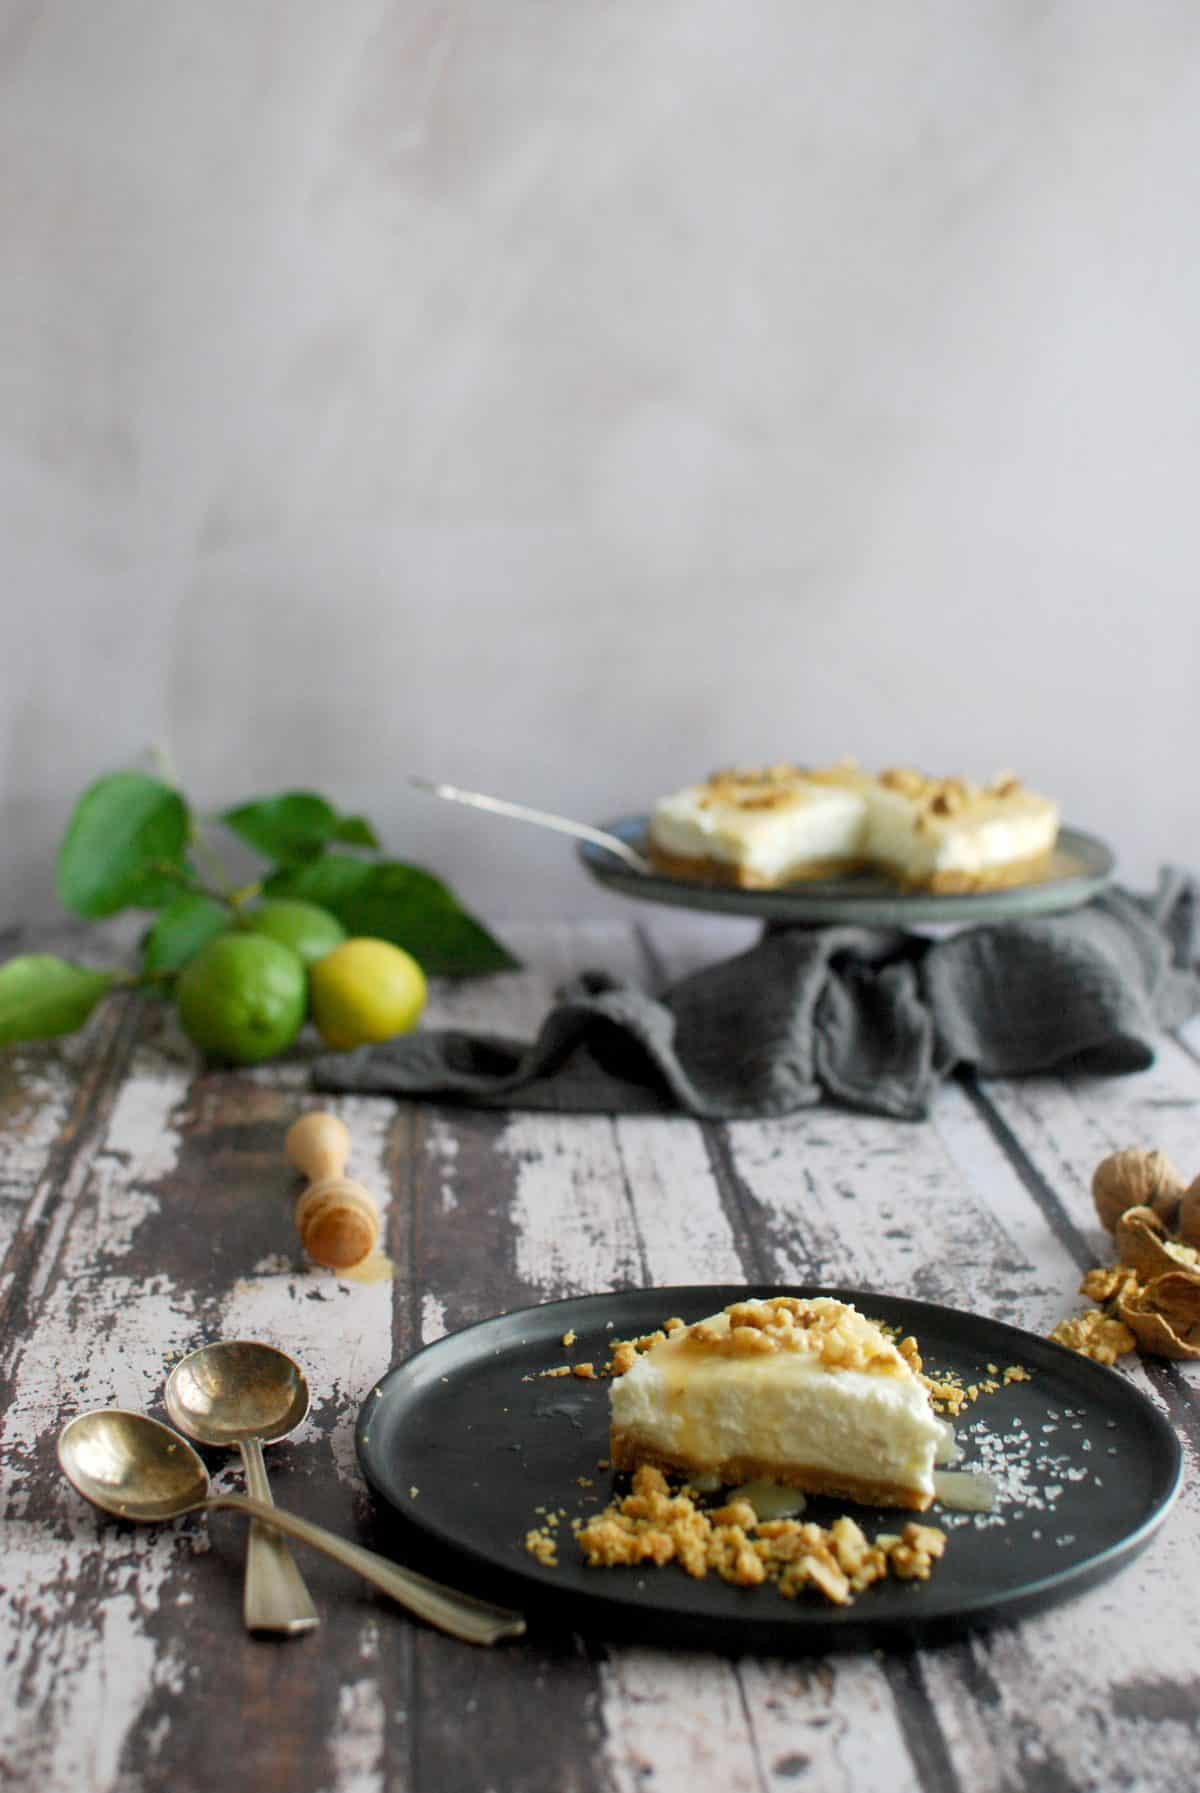 cheesecake με ανθότυρο, μέλι, καρύδια